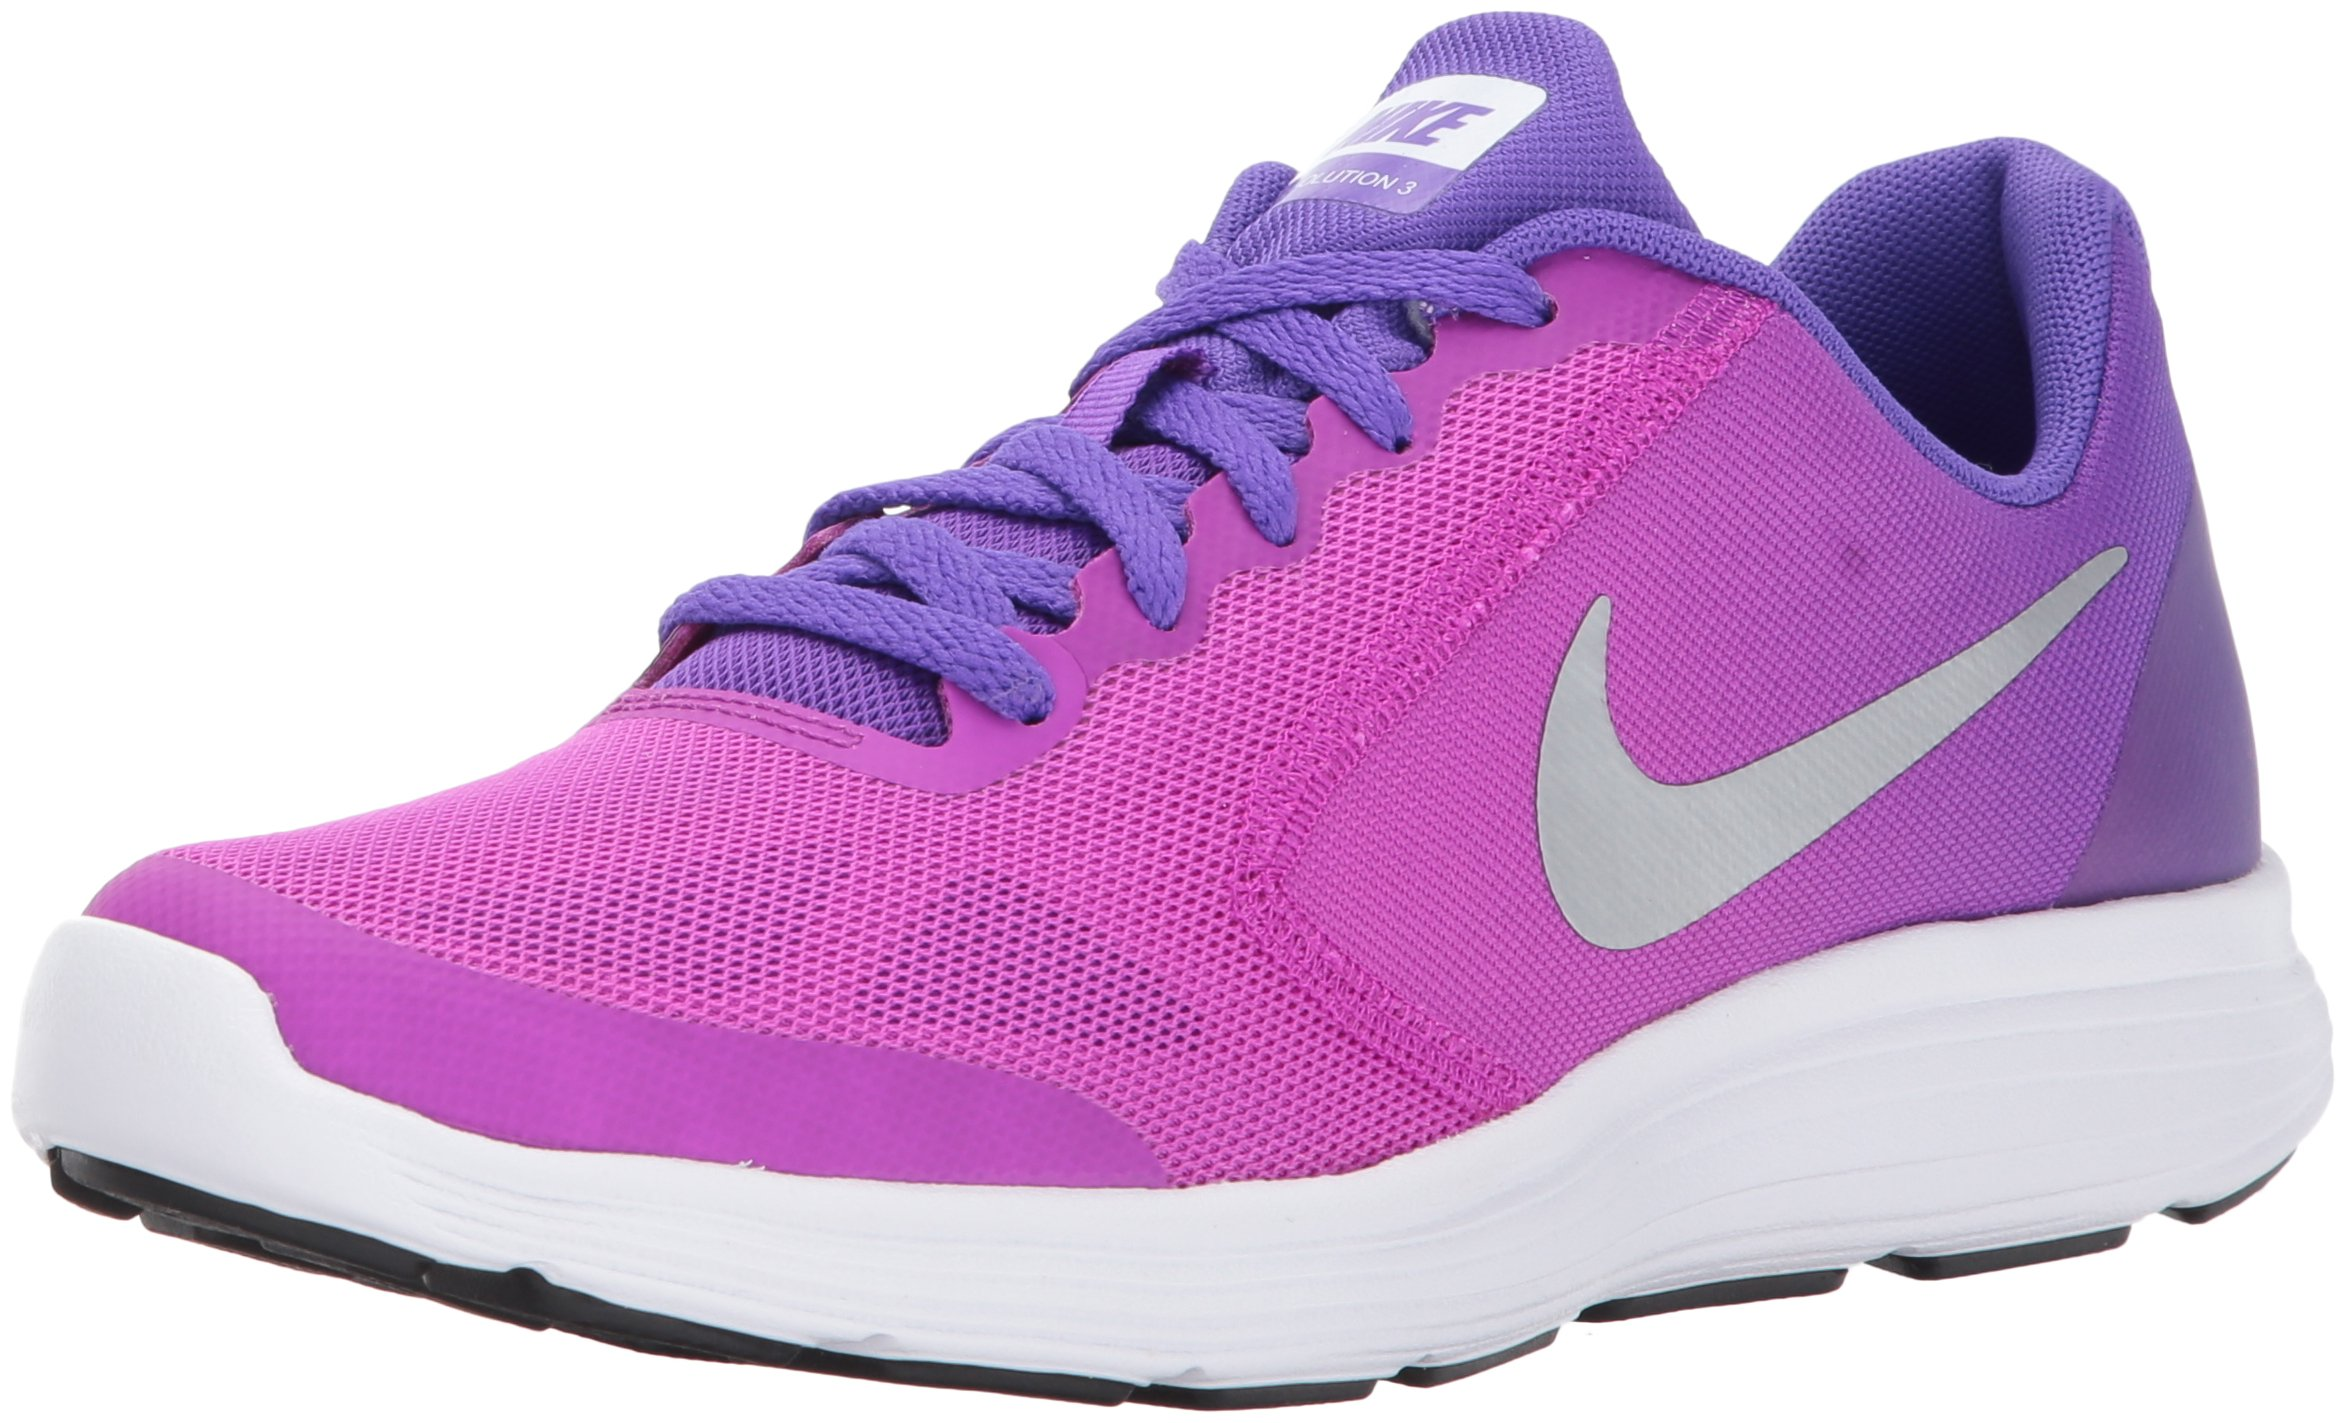 M Big Nike Silverhyper Girls' ShoeVioletmetallic 3gsRunning 5 Us Revolution Kid Grape5 nwP8X0Ok